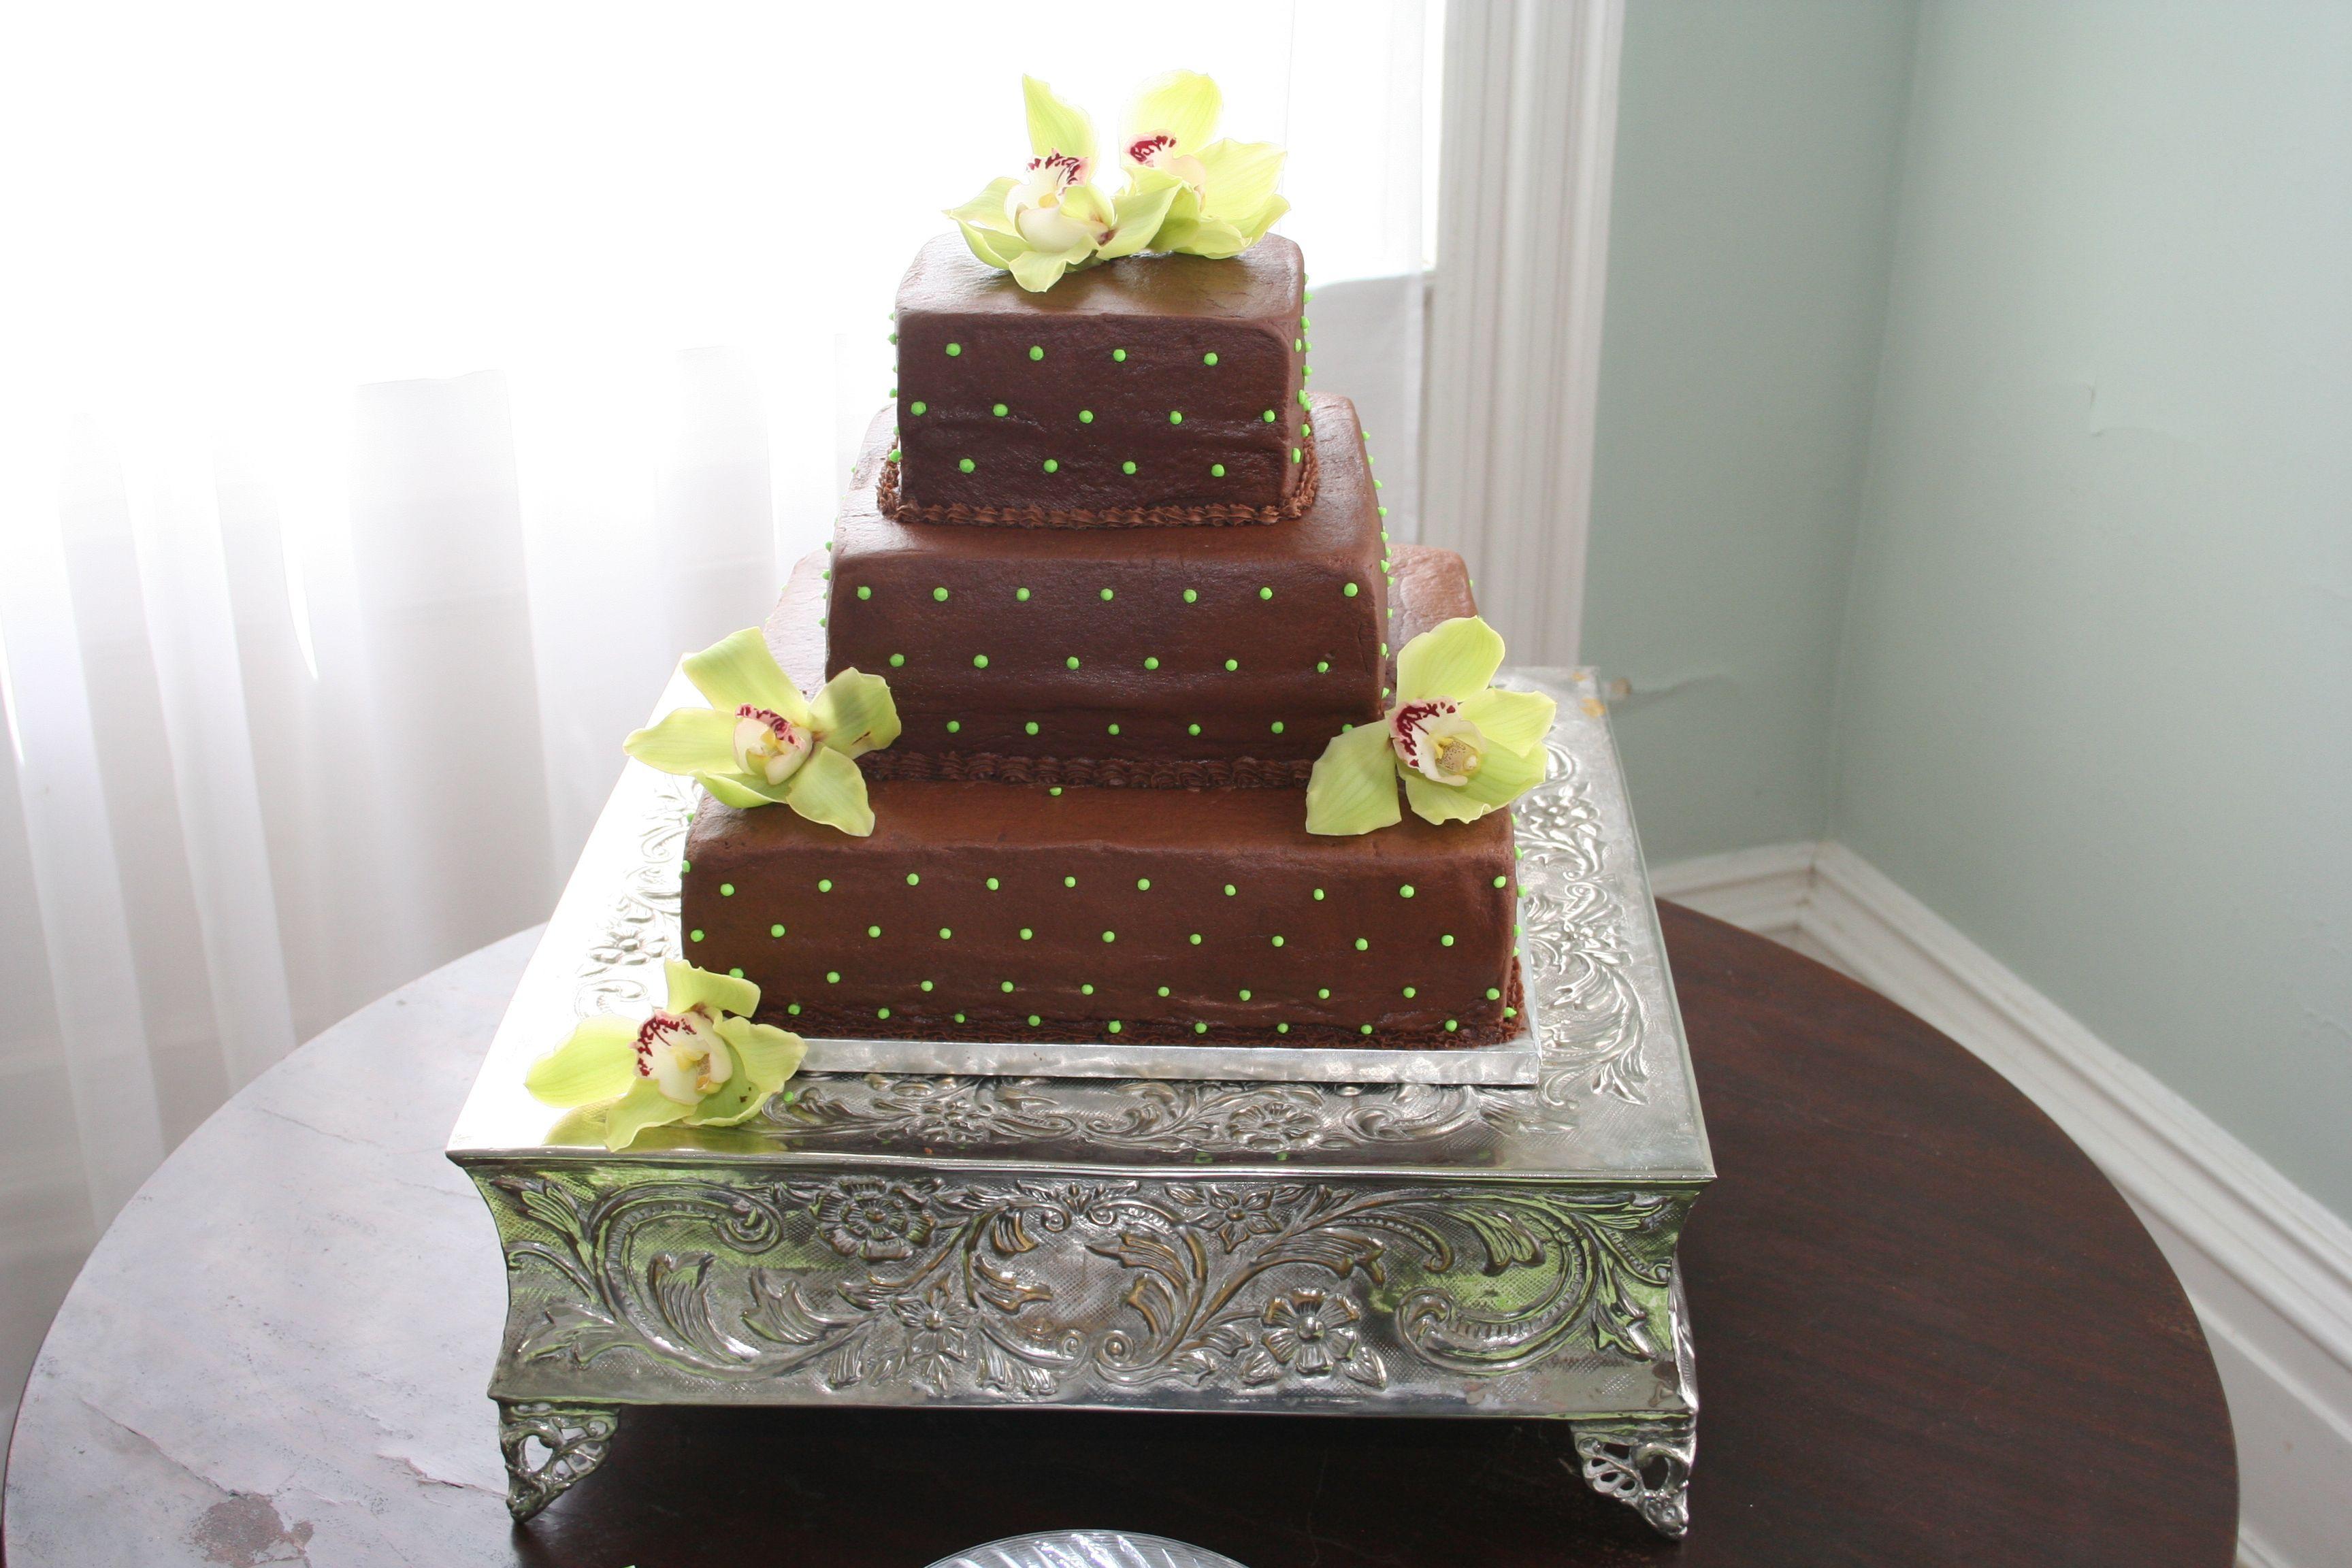 Chocolate peanut butter wedding cake